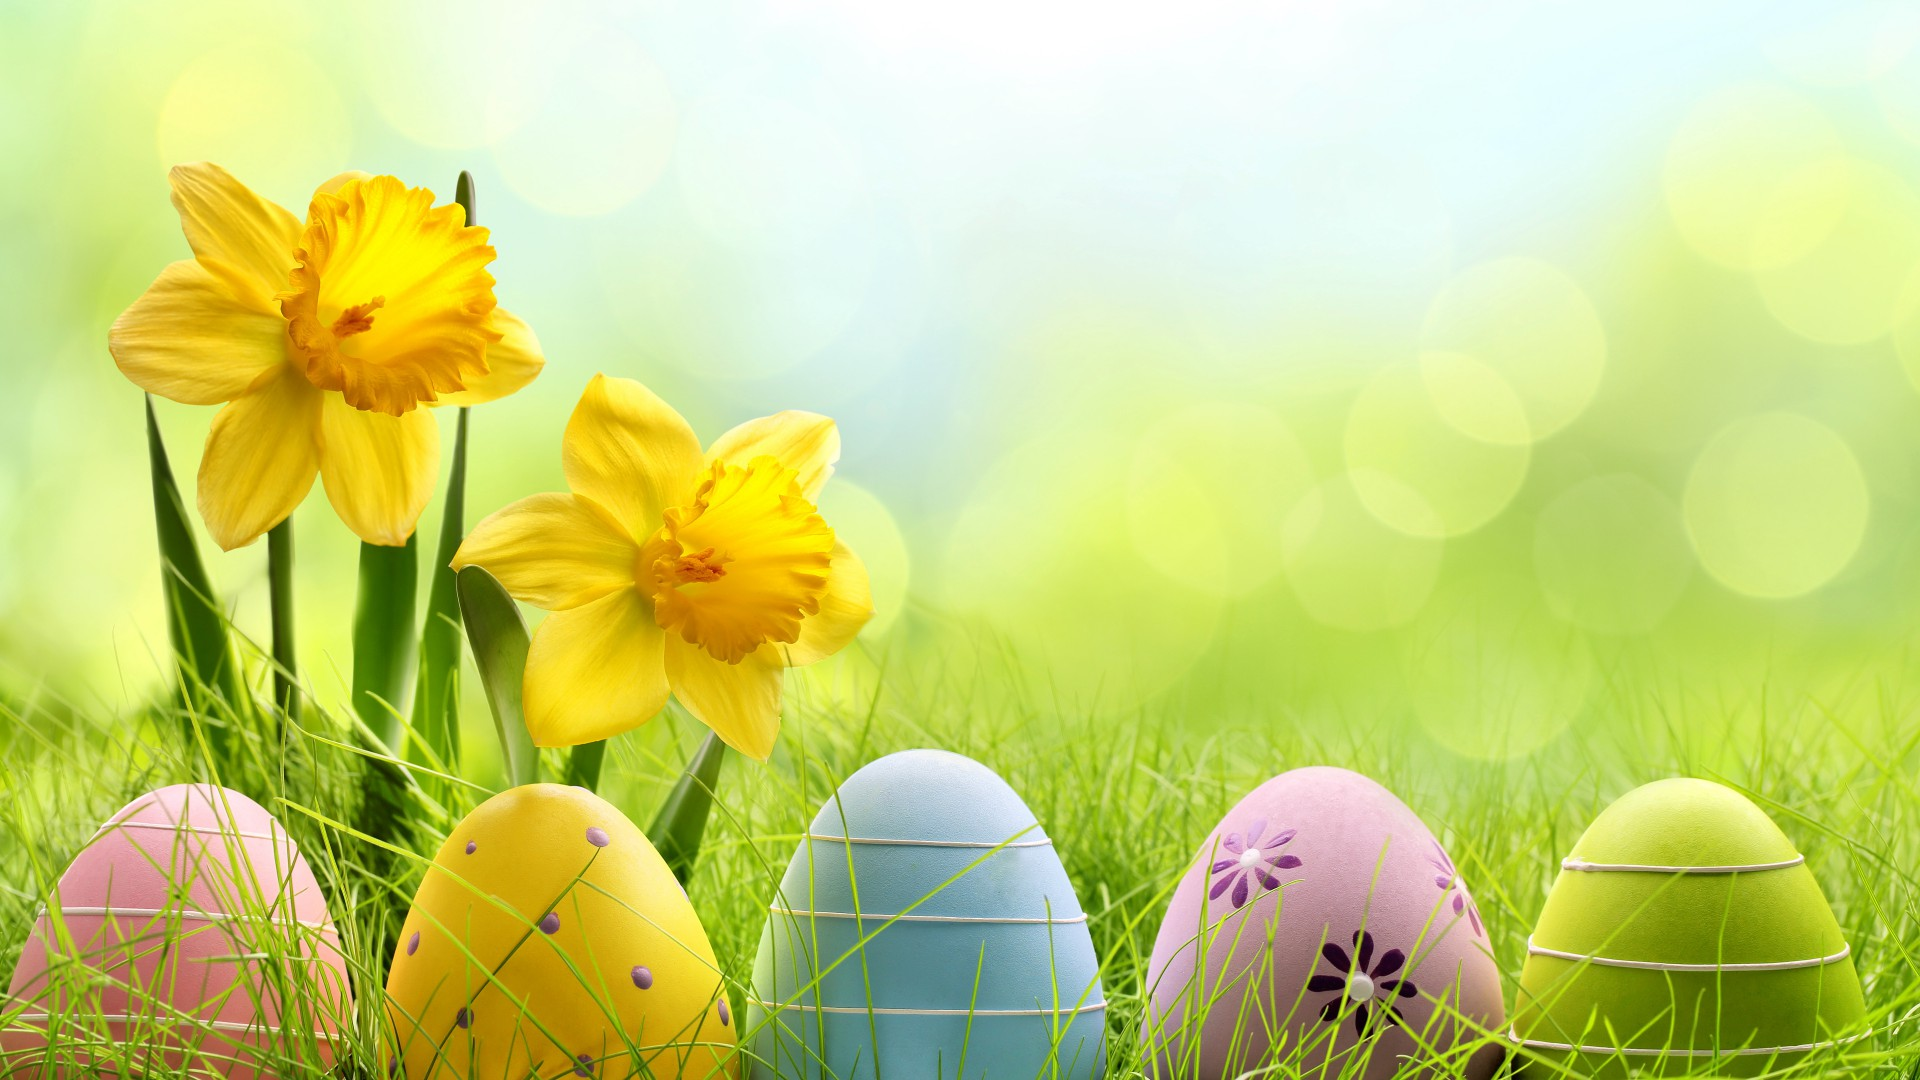 Wallpaper Easter Spring Flowers Eggs Basket Holidays